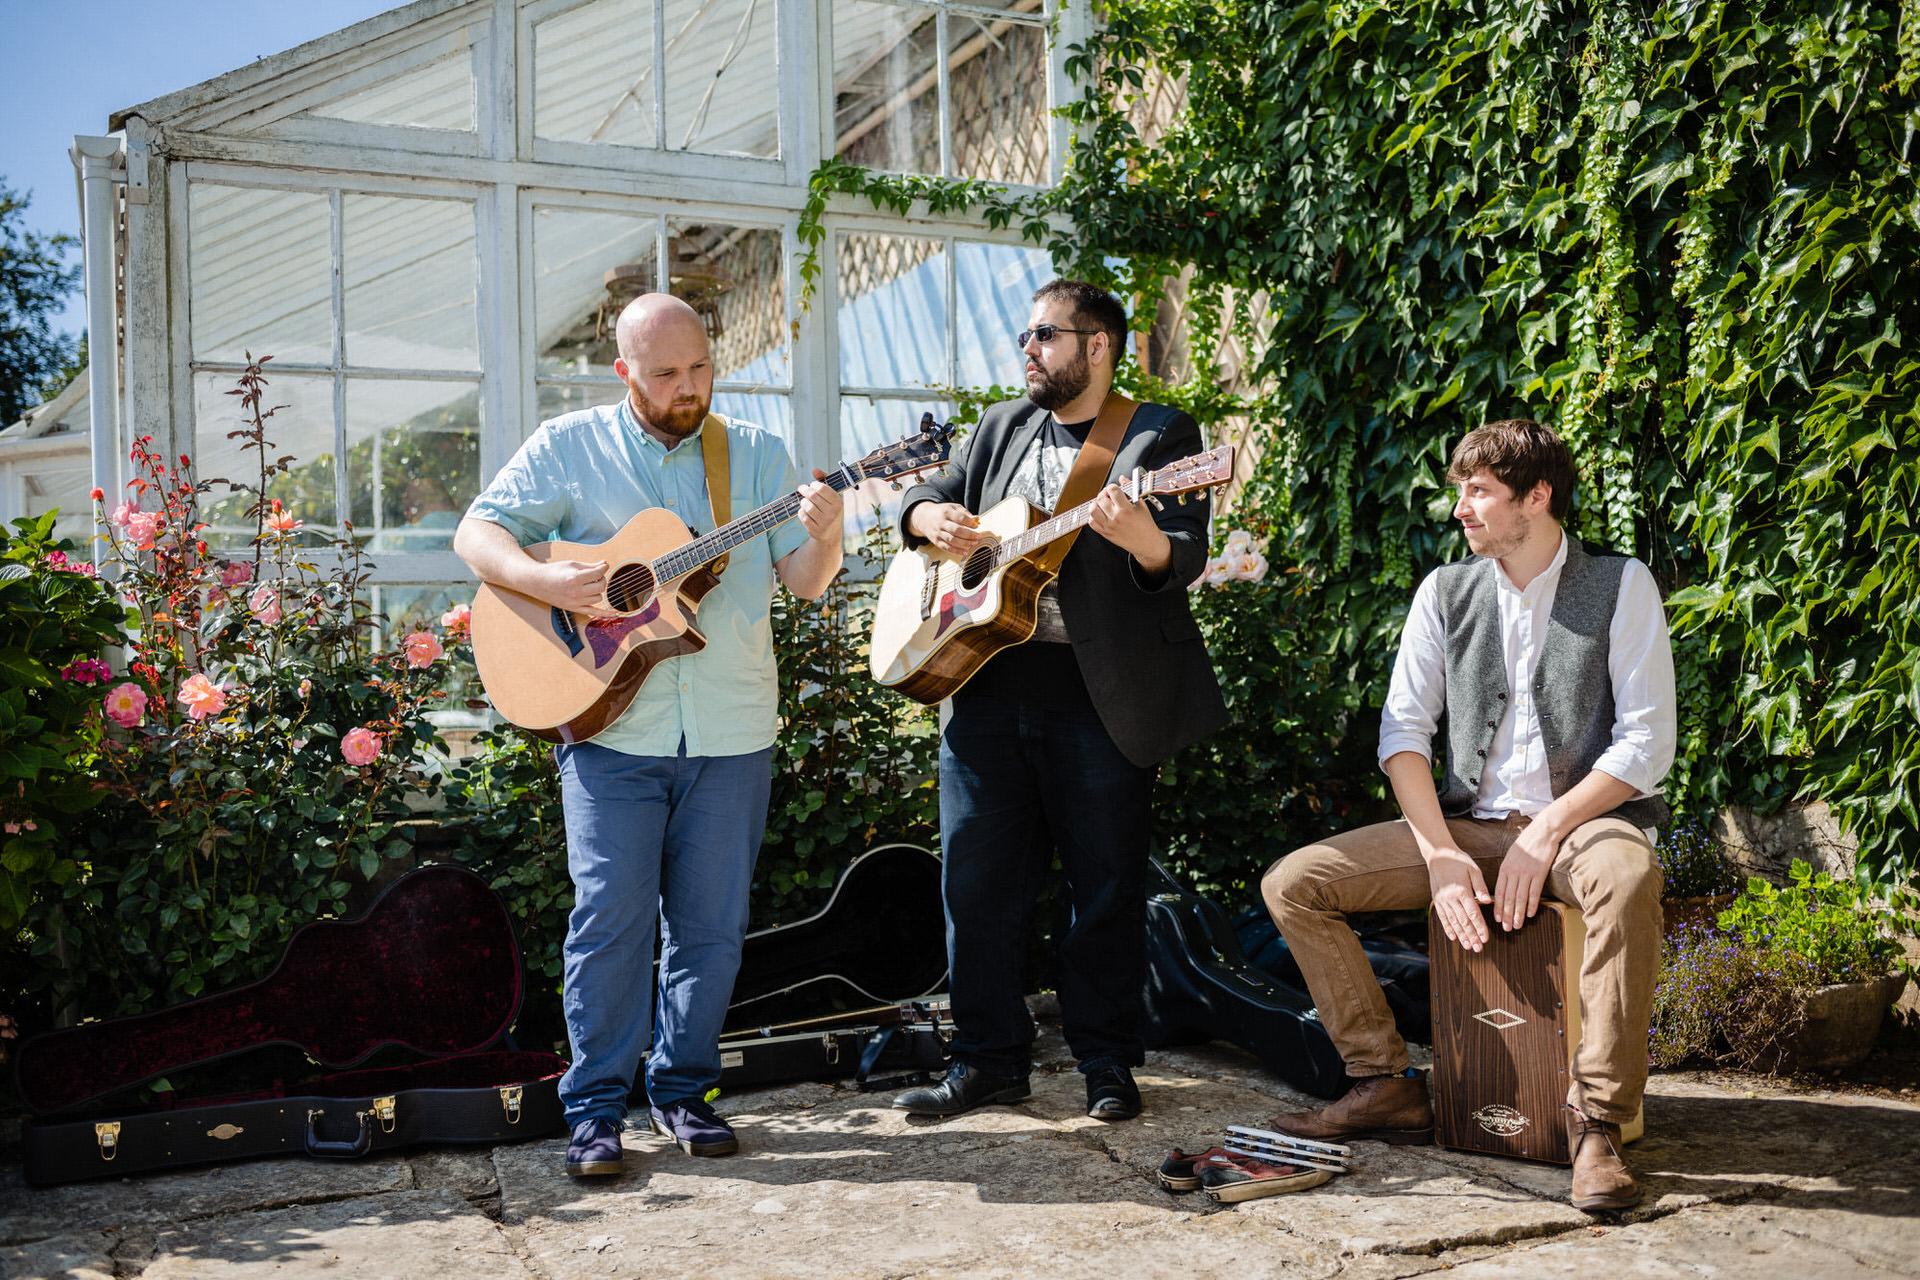 The Nameless Three band